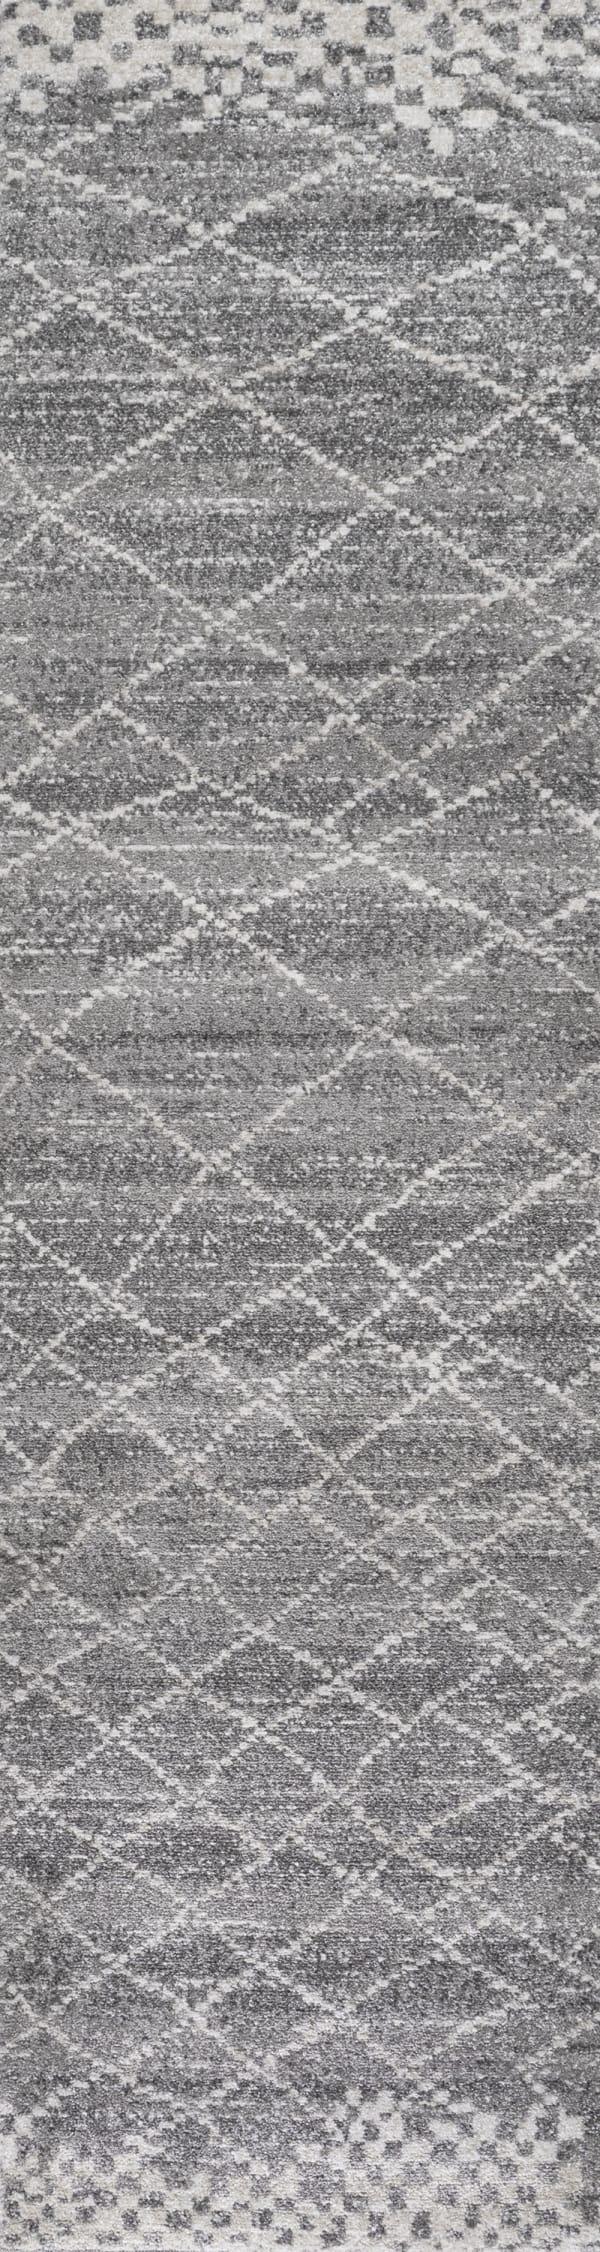 Moroccan Modern Diamond Gray Runner Rug